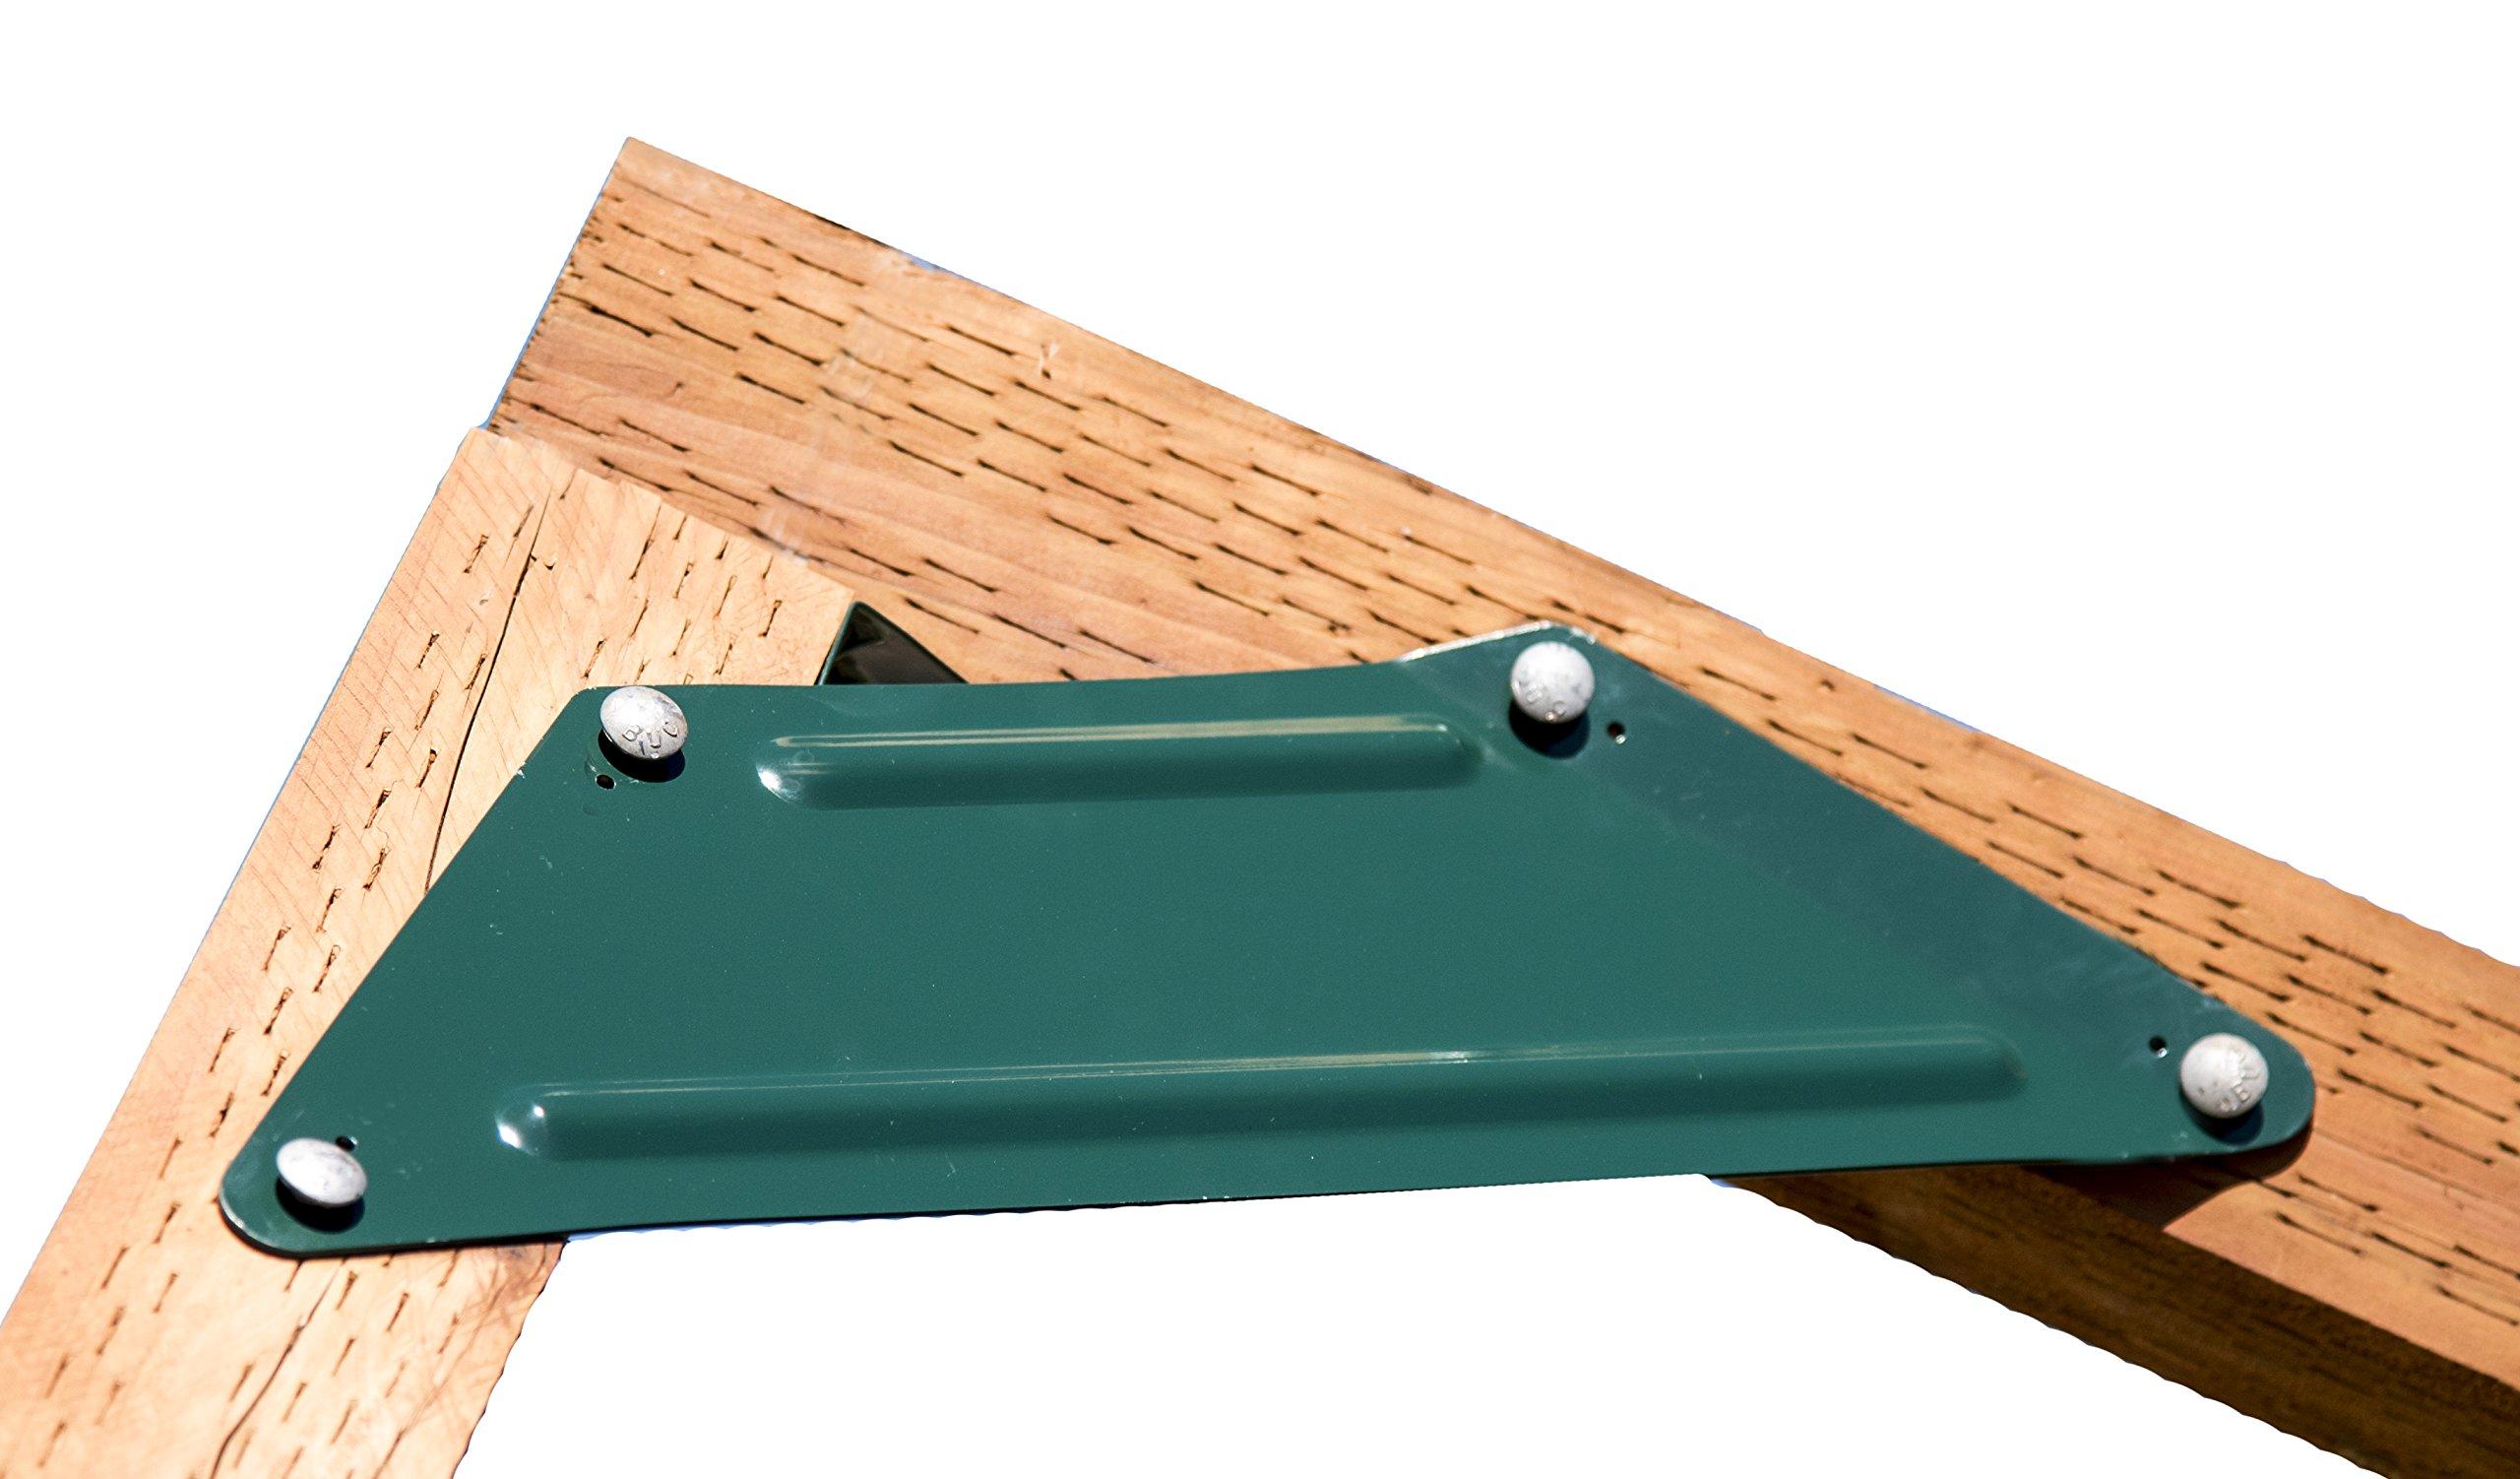 DIY Swing Set Brackets - Right/Left Braces Set of 2 - Do It Yourself Swing Set Hardware